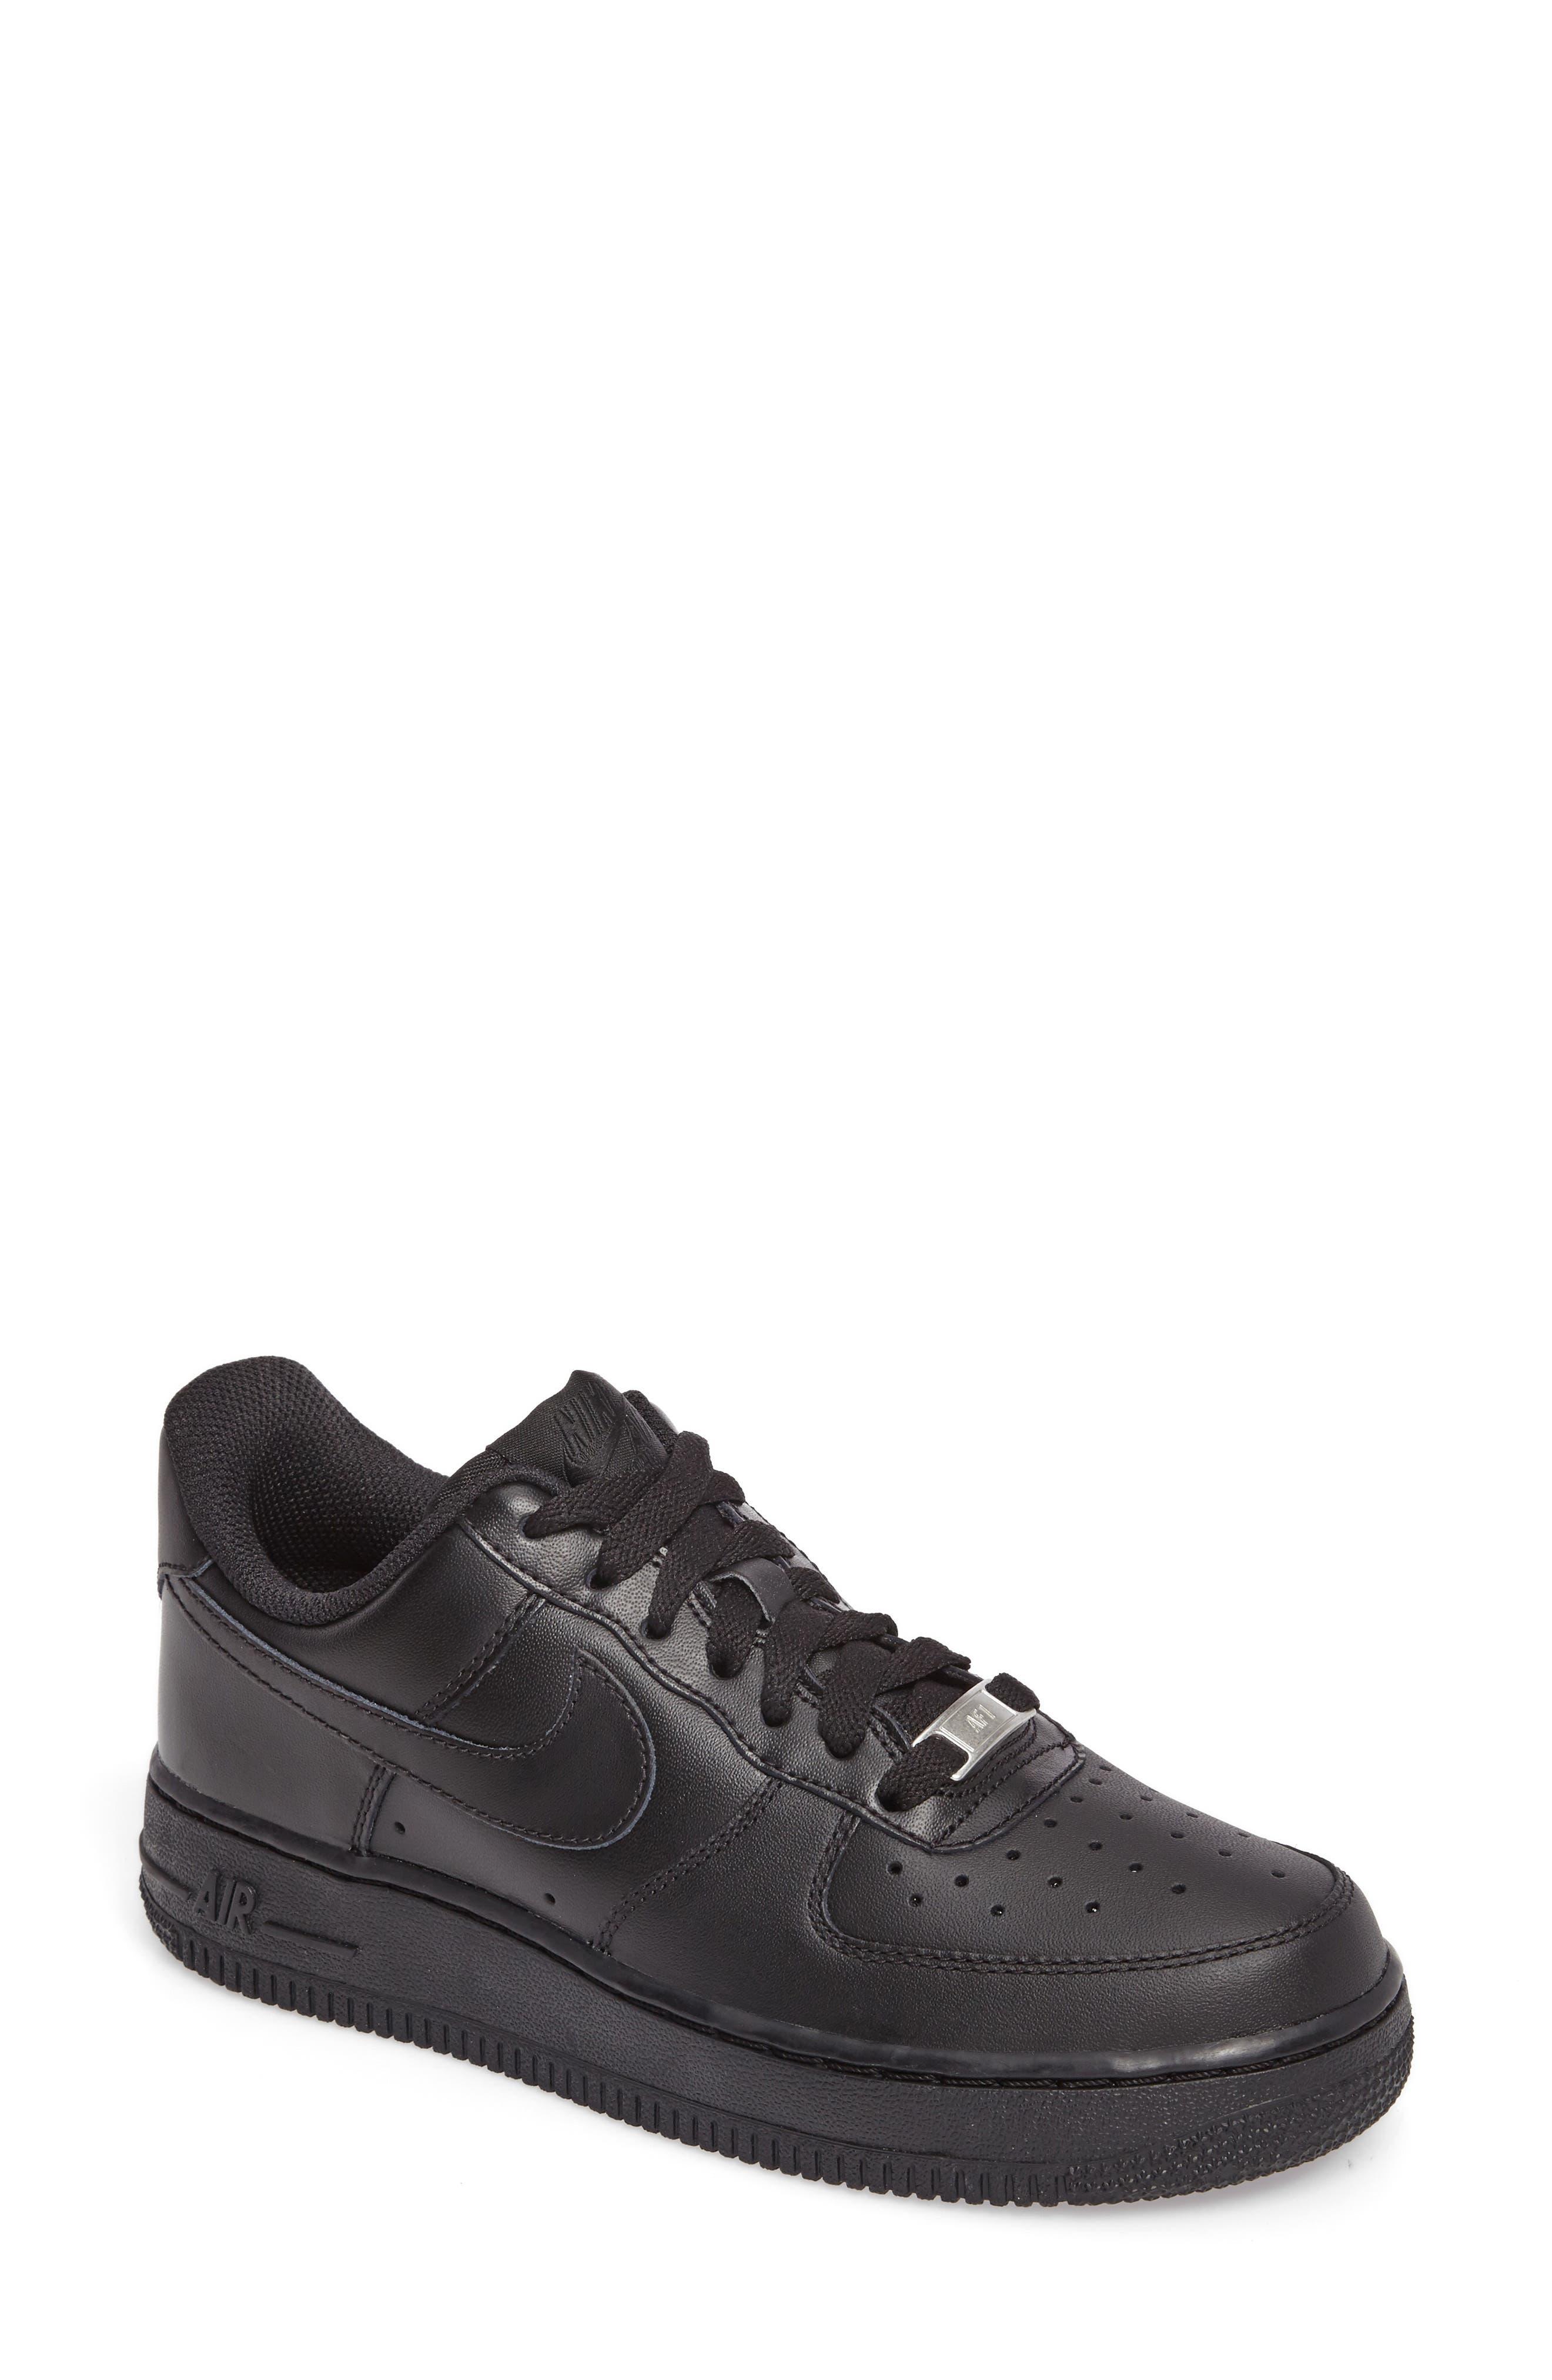 Nike Air Force 1 Sneaker (Women